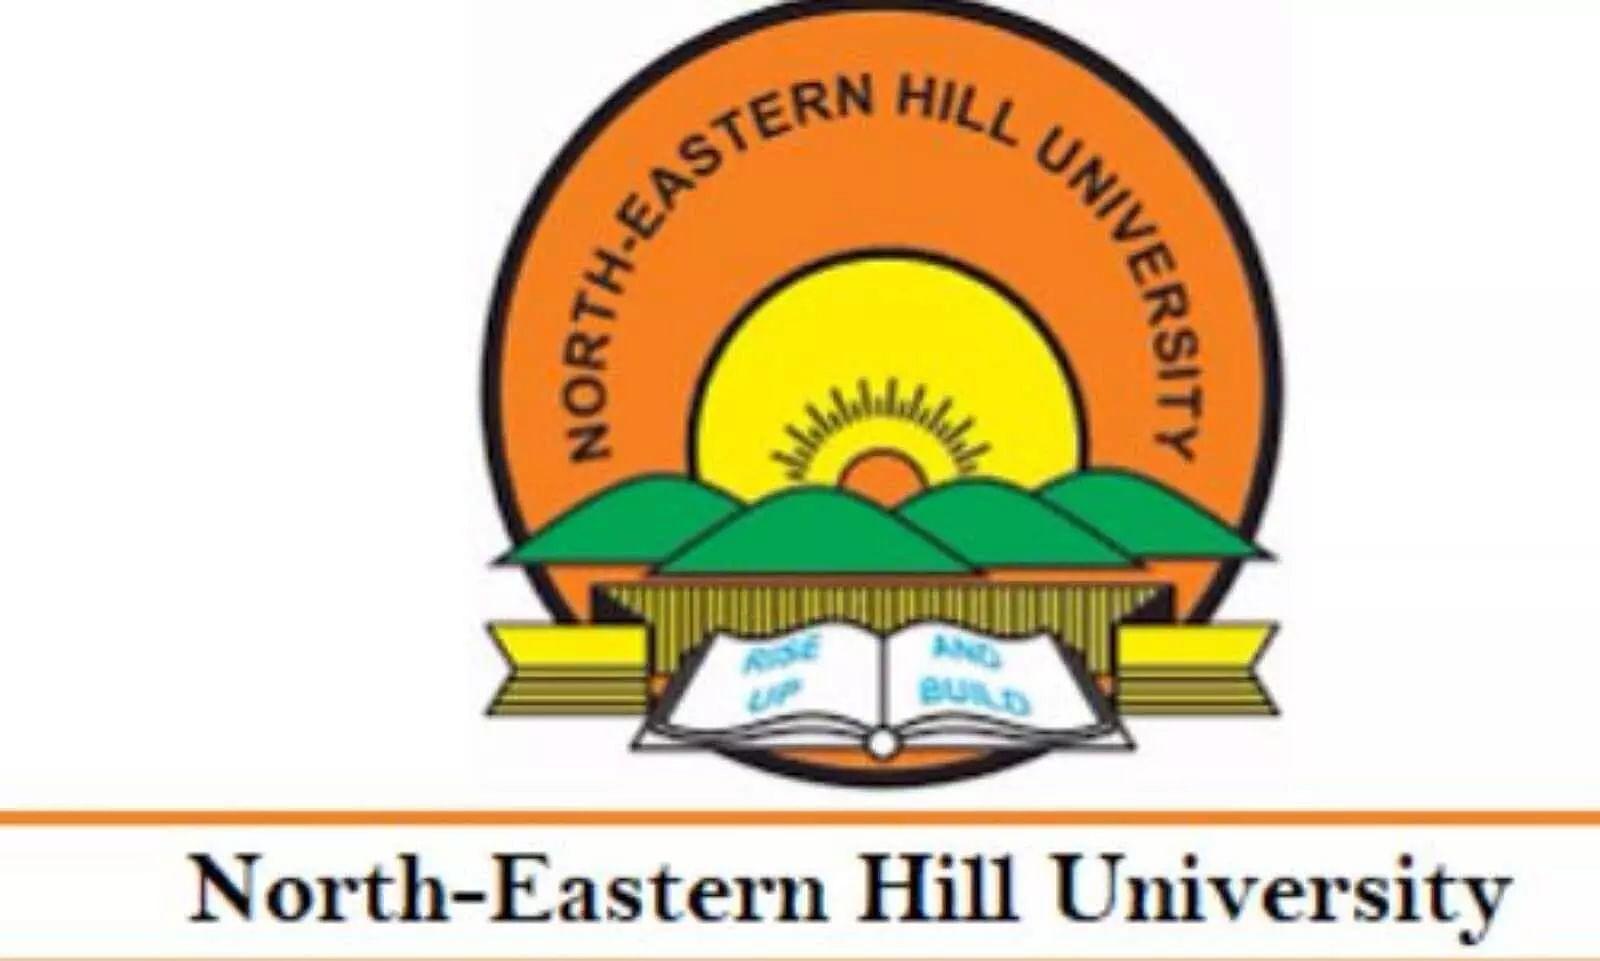 North-Eastern Hill University (NEHU) Recruitment 2021 - Project Associate & Assistant Vacancy, Job Openings